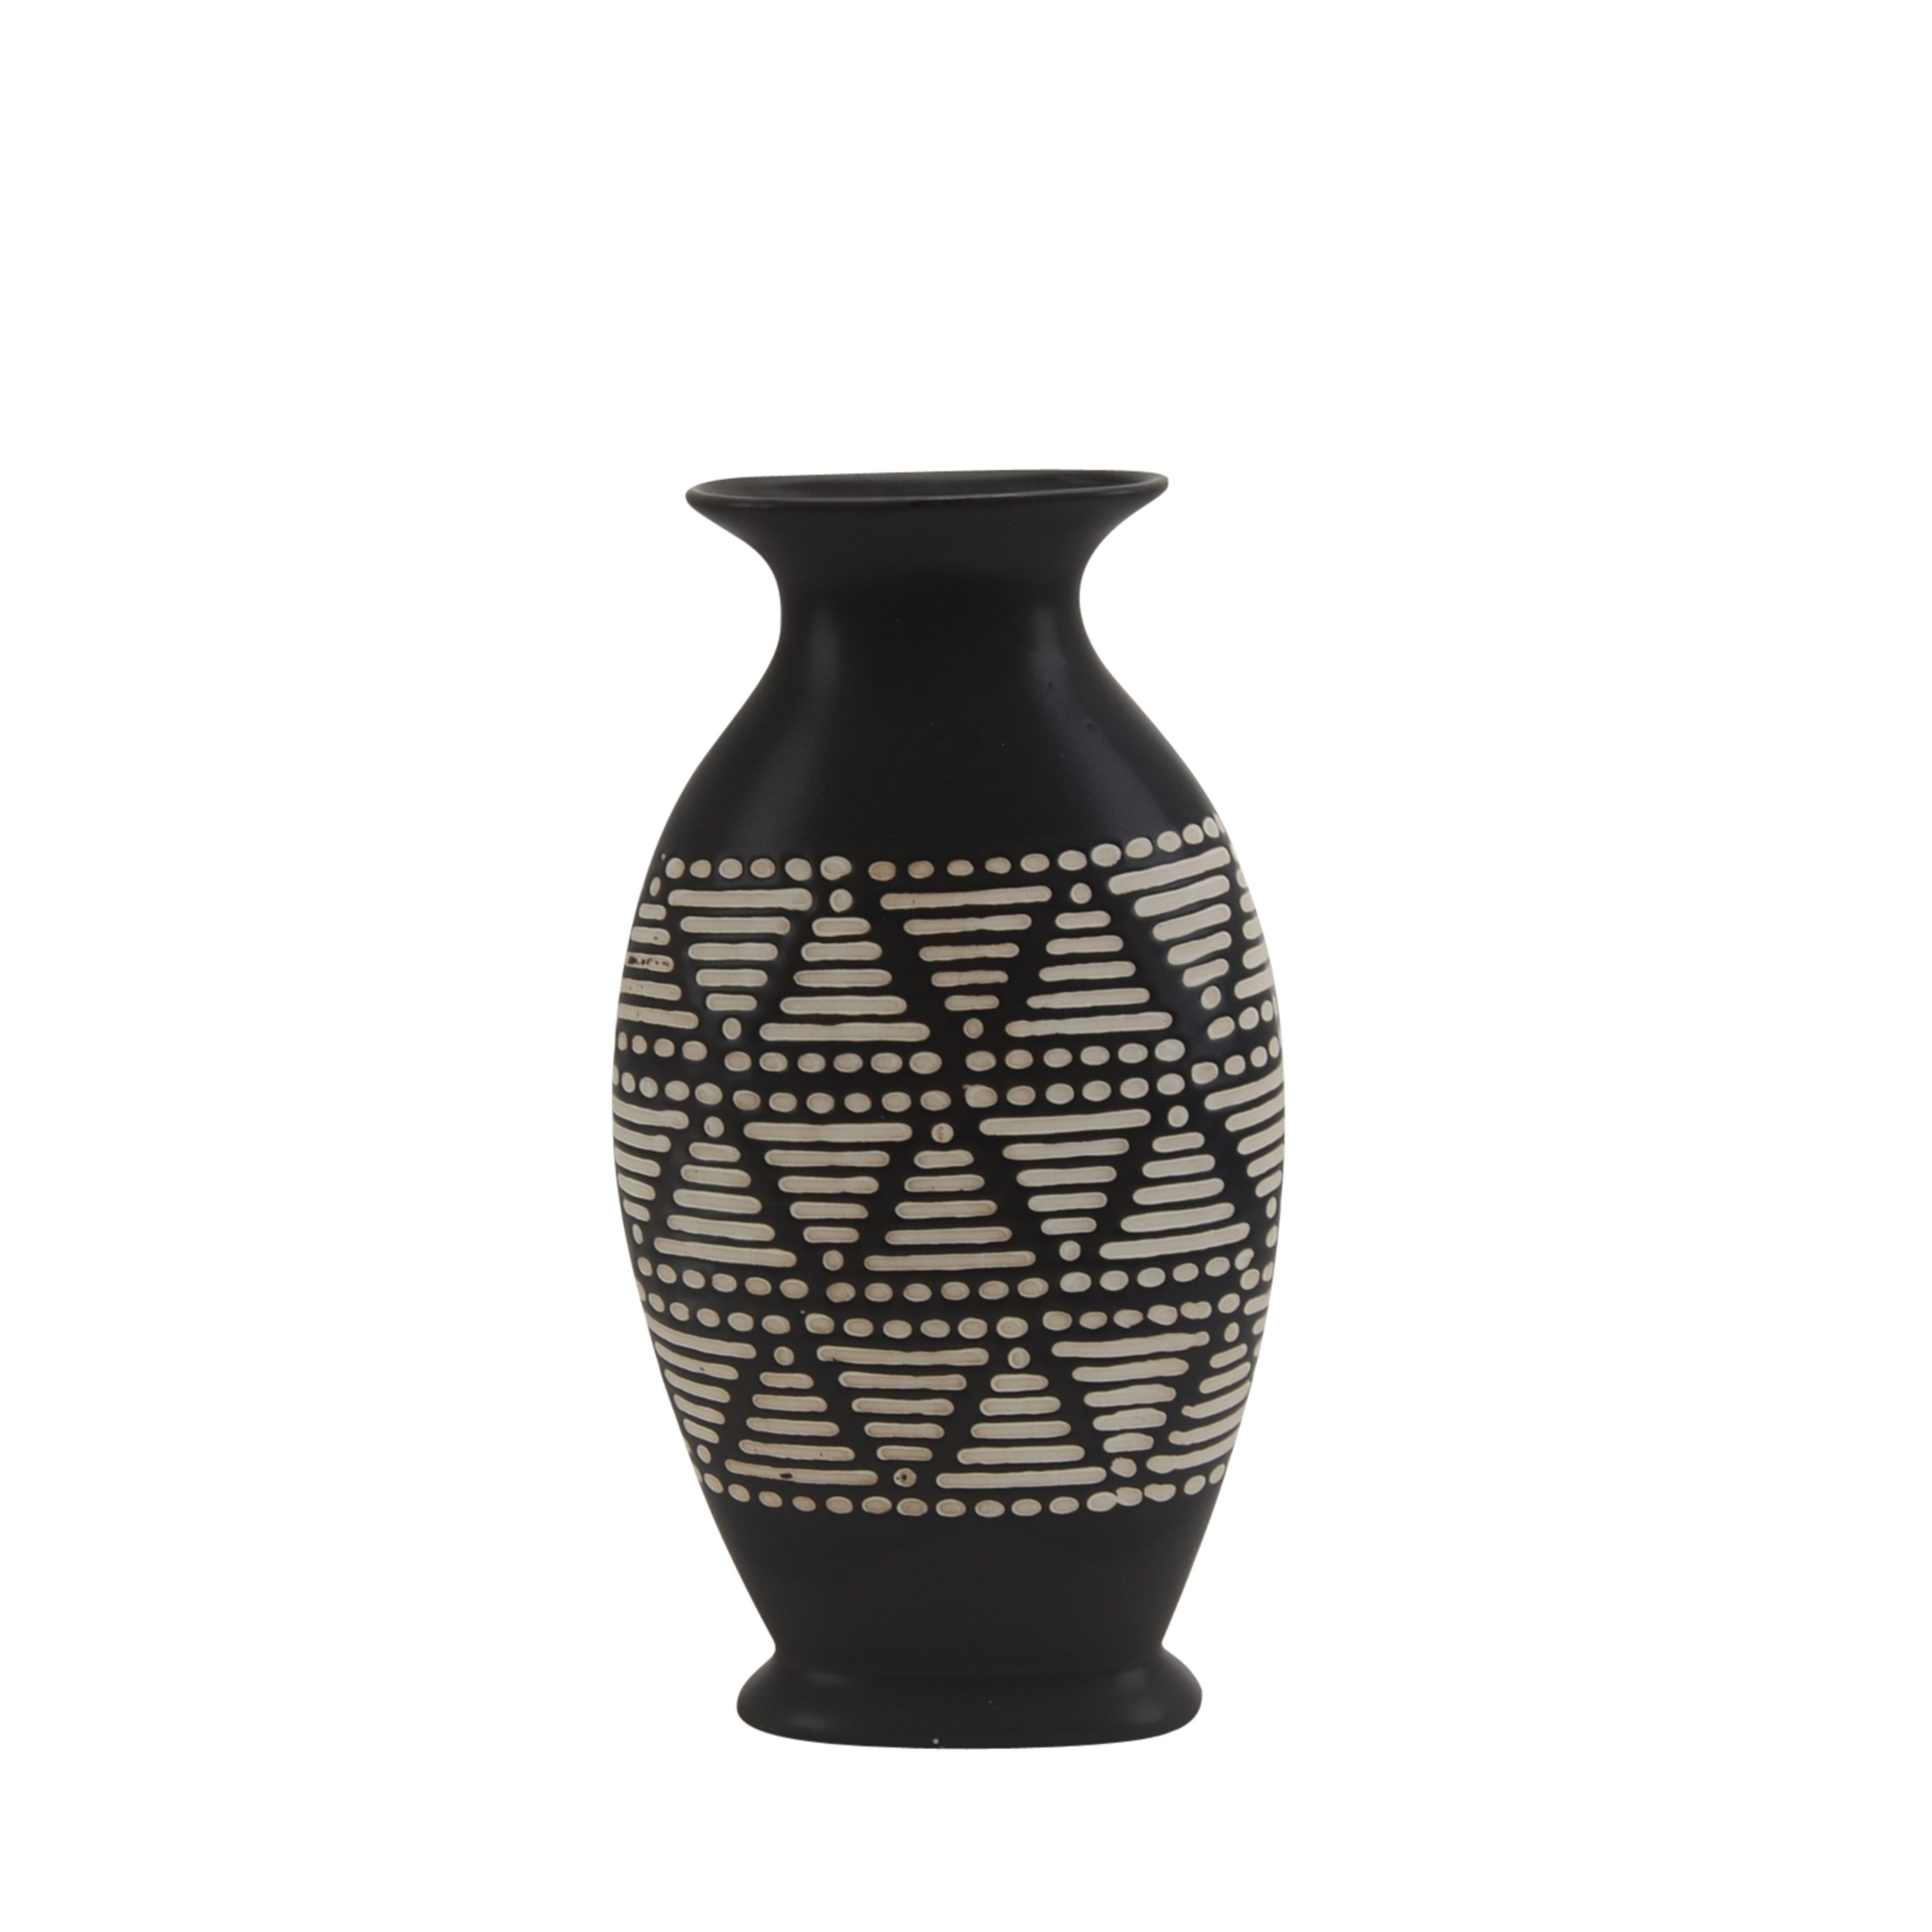 Urn Shape Ceramic Vase with Tribal Design, Black and White